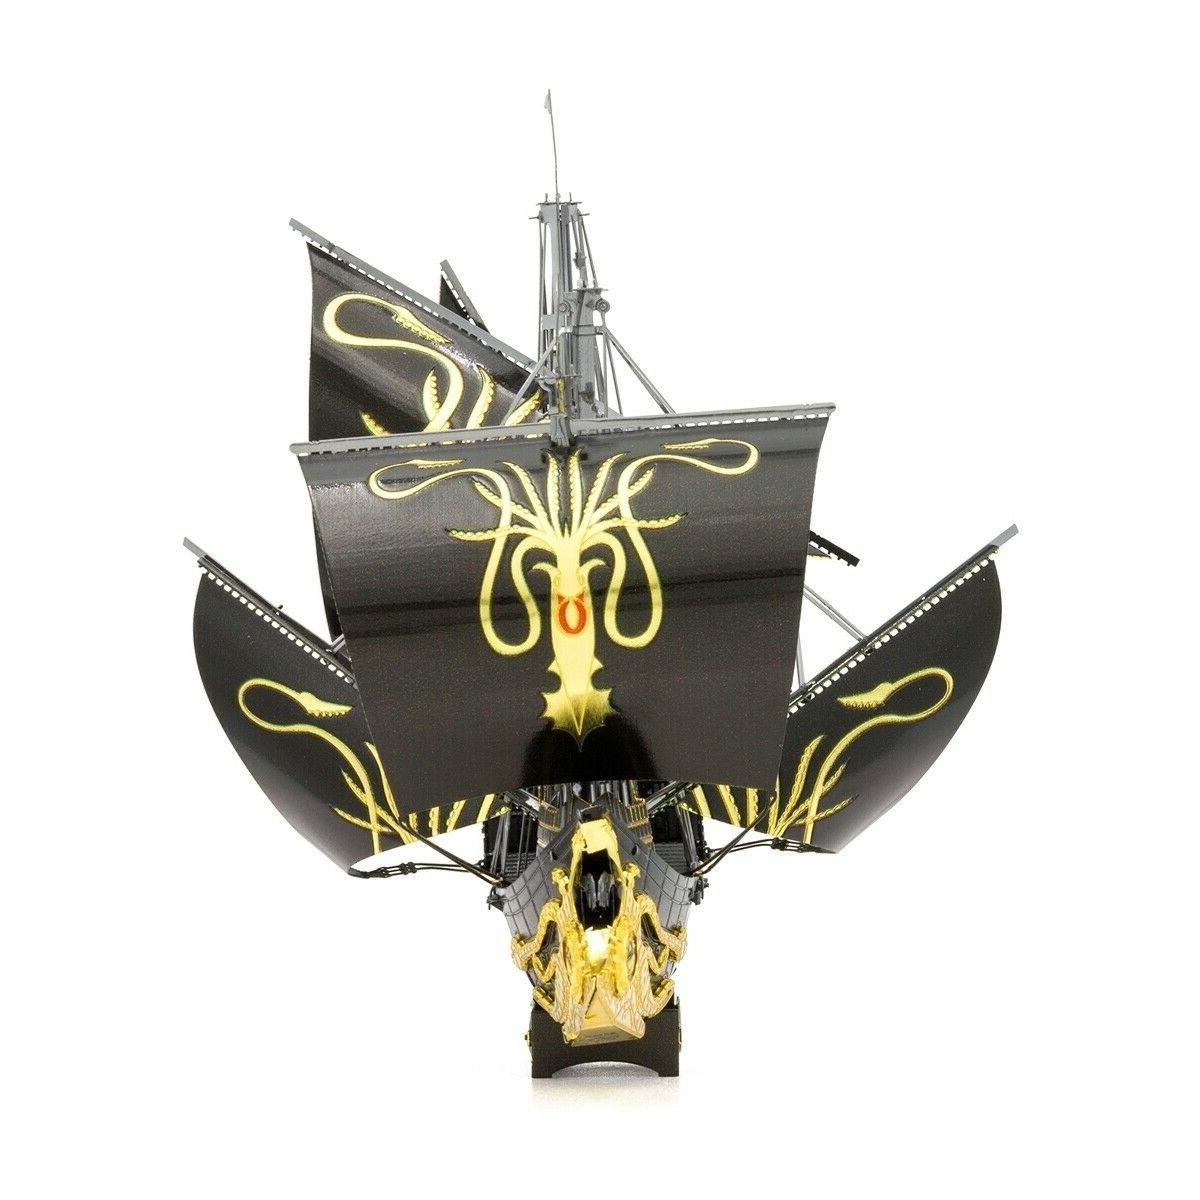 Fascinations Game Thrones 3D Metal Model Kit ICX126